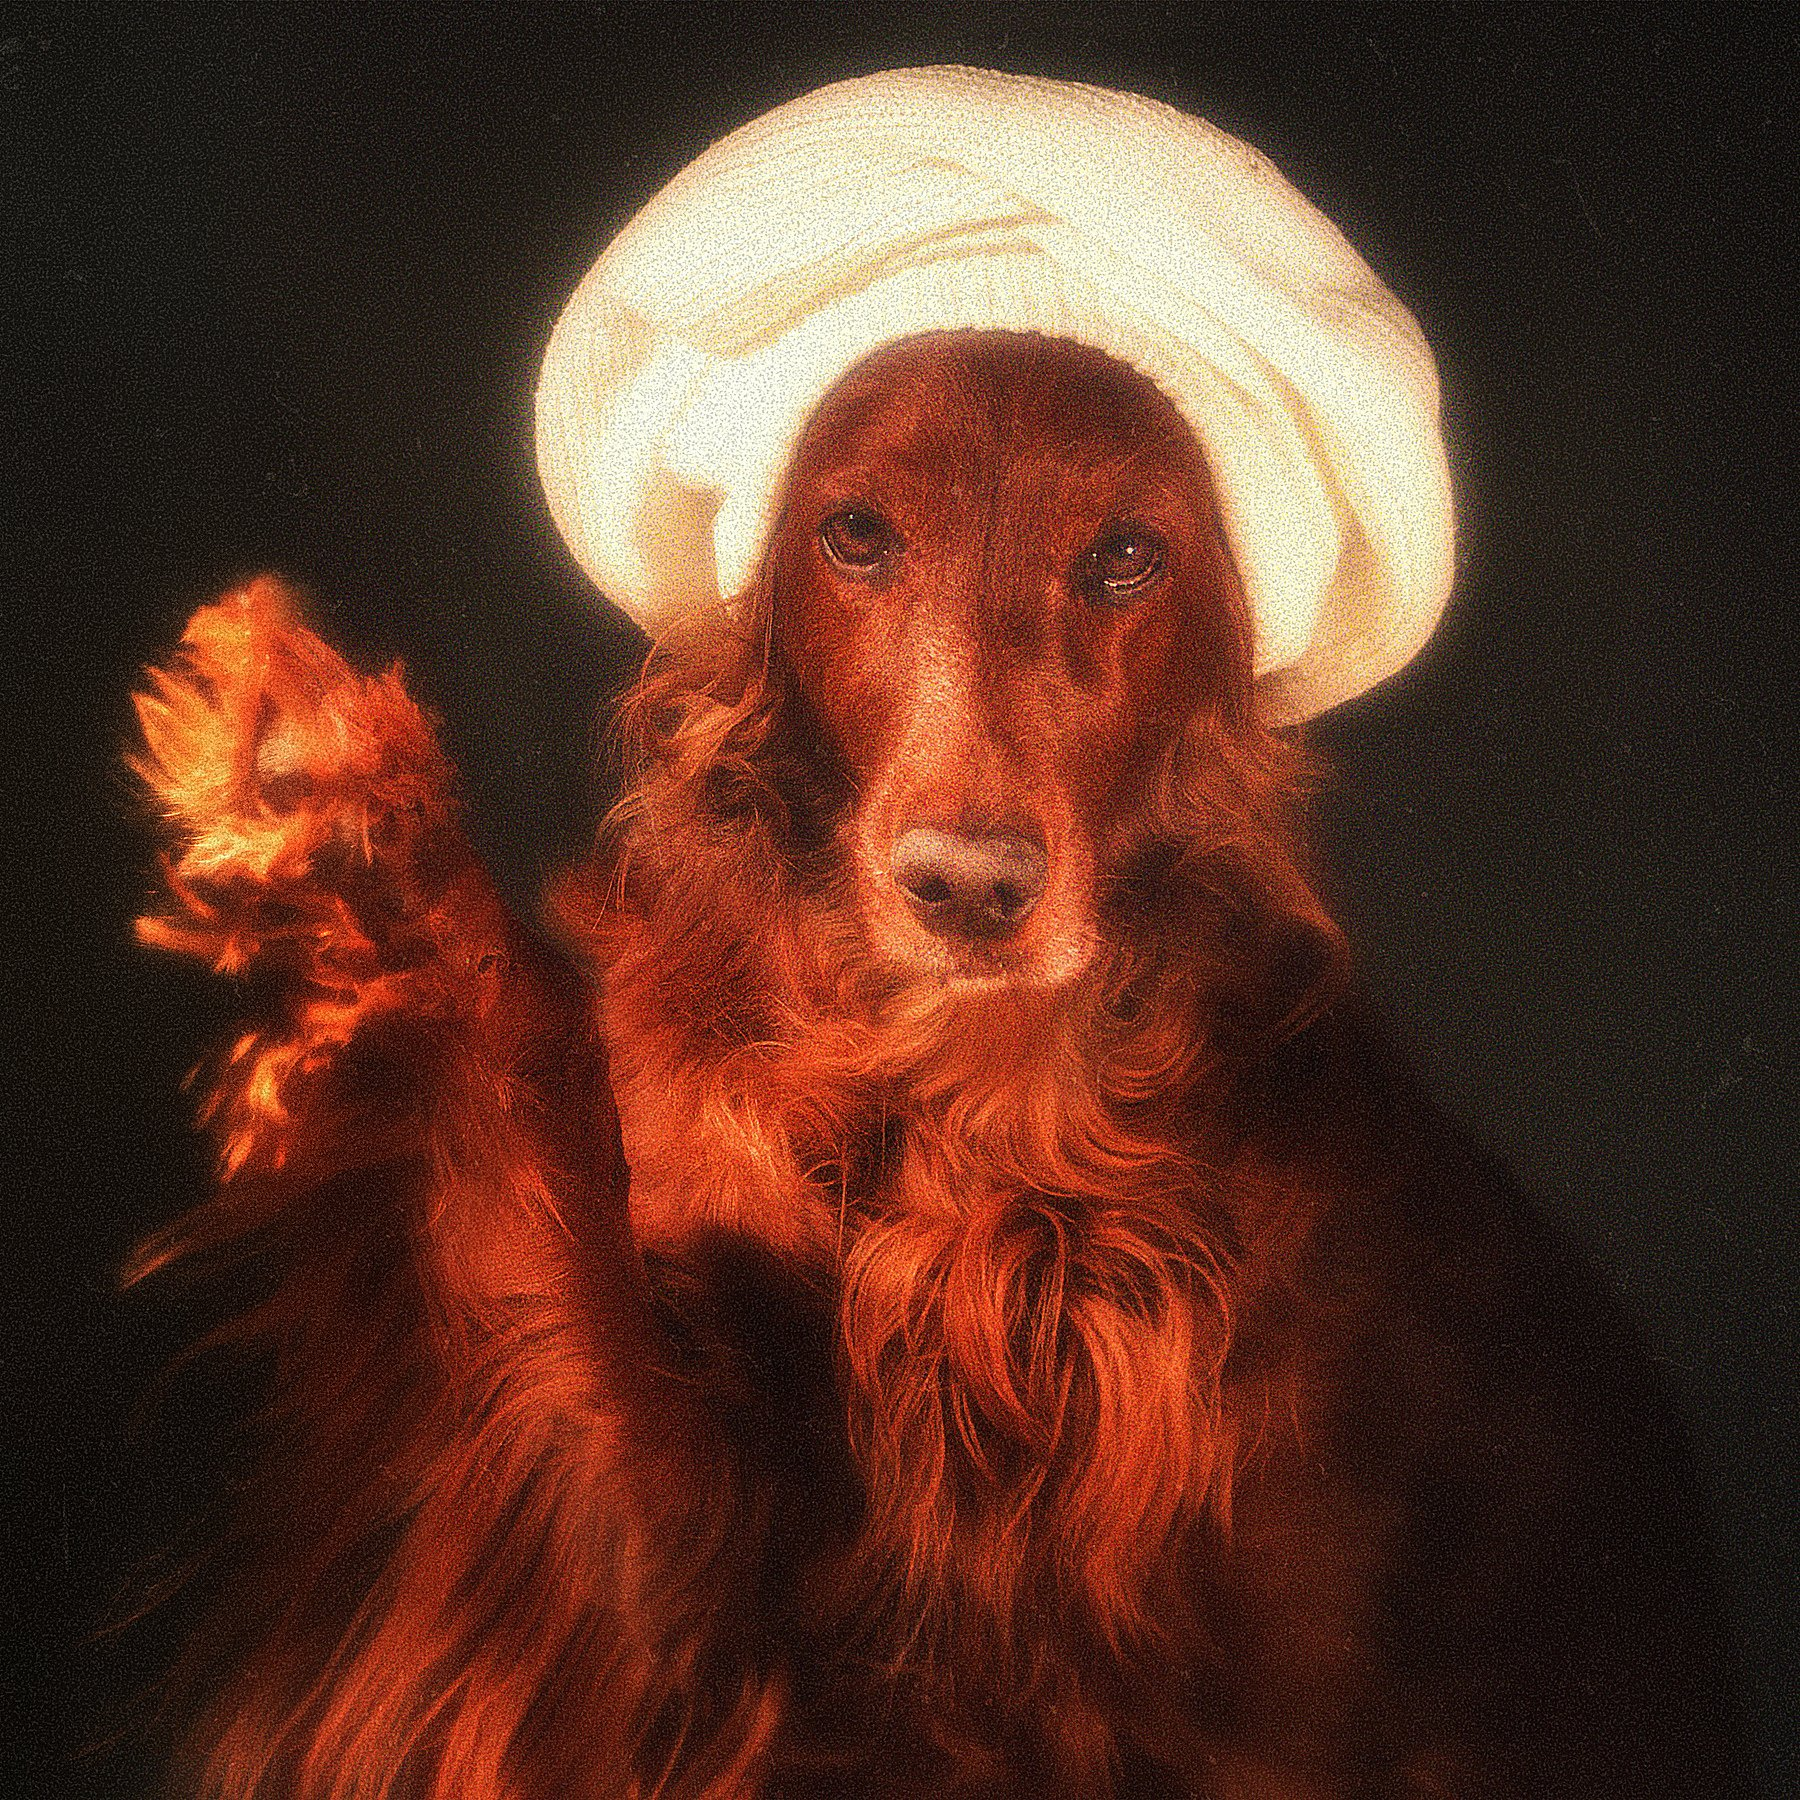 собака, сеттер, арт, портрет, взгляд, картина, , Константин